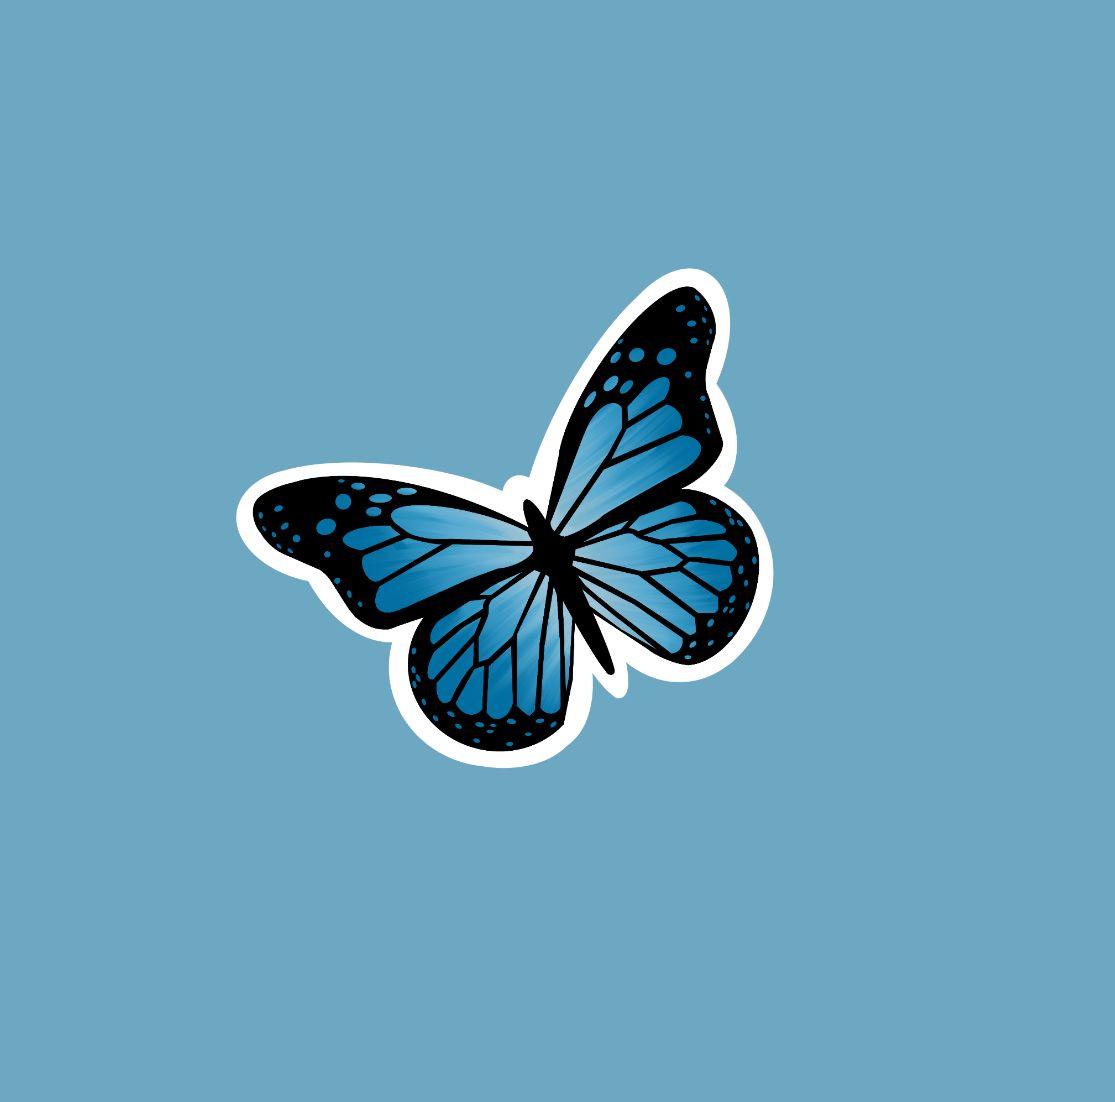 Cute Aesthetic Butterfly Stickers In 2021 Blue Butterfly Butterfly Wallpaper Butterfly Wallpaper Iphone